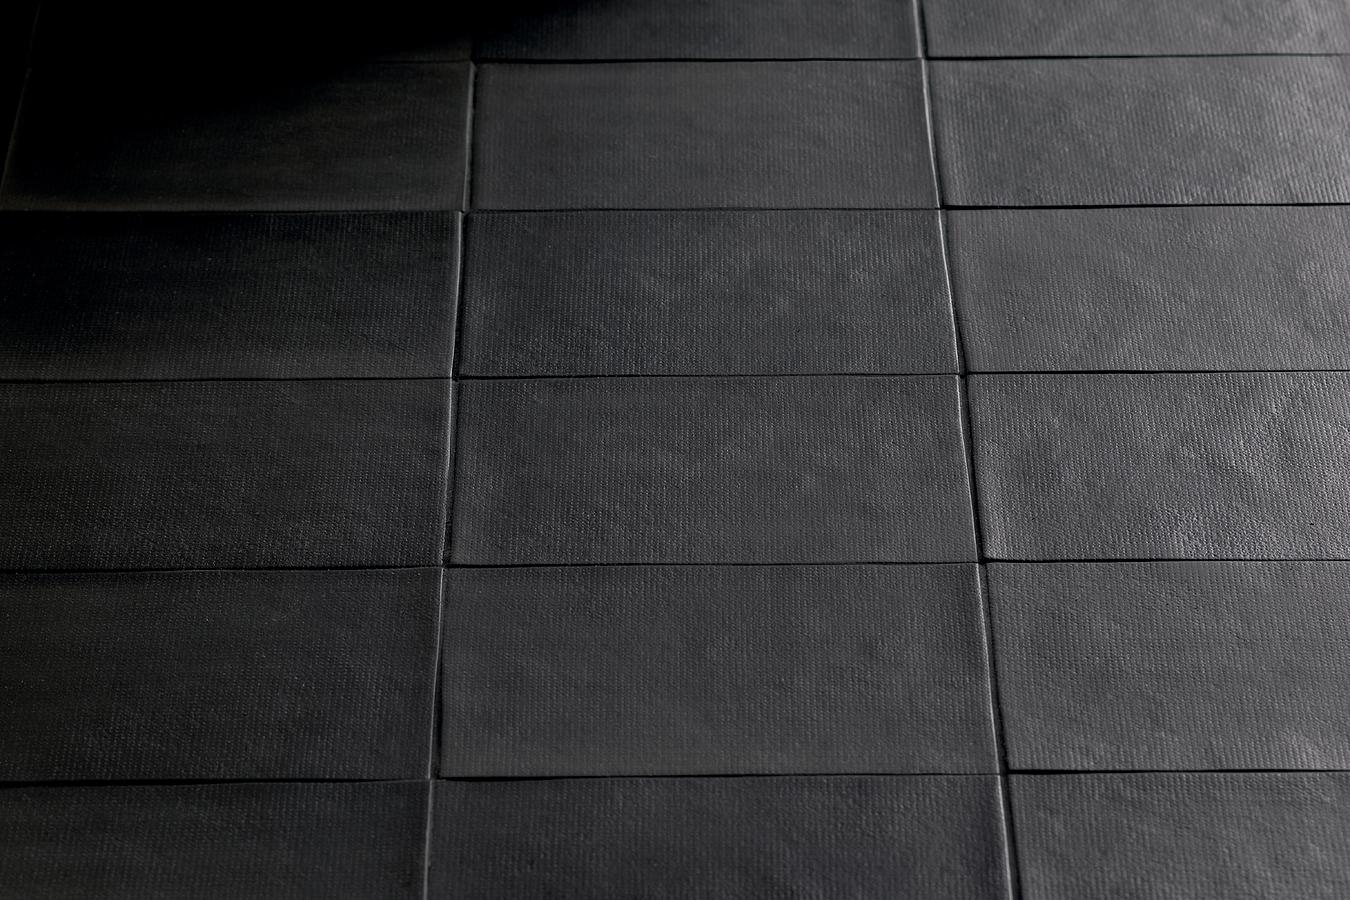 Gr s c rame bas relief de mutina tile expert fournisseur de carrelage italien - Carrelage italien gres cerame ...